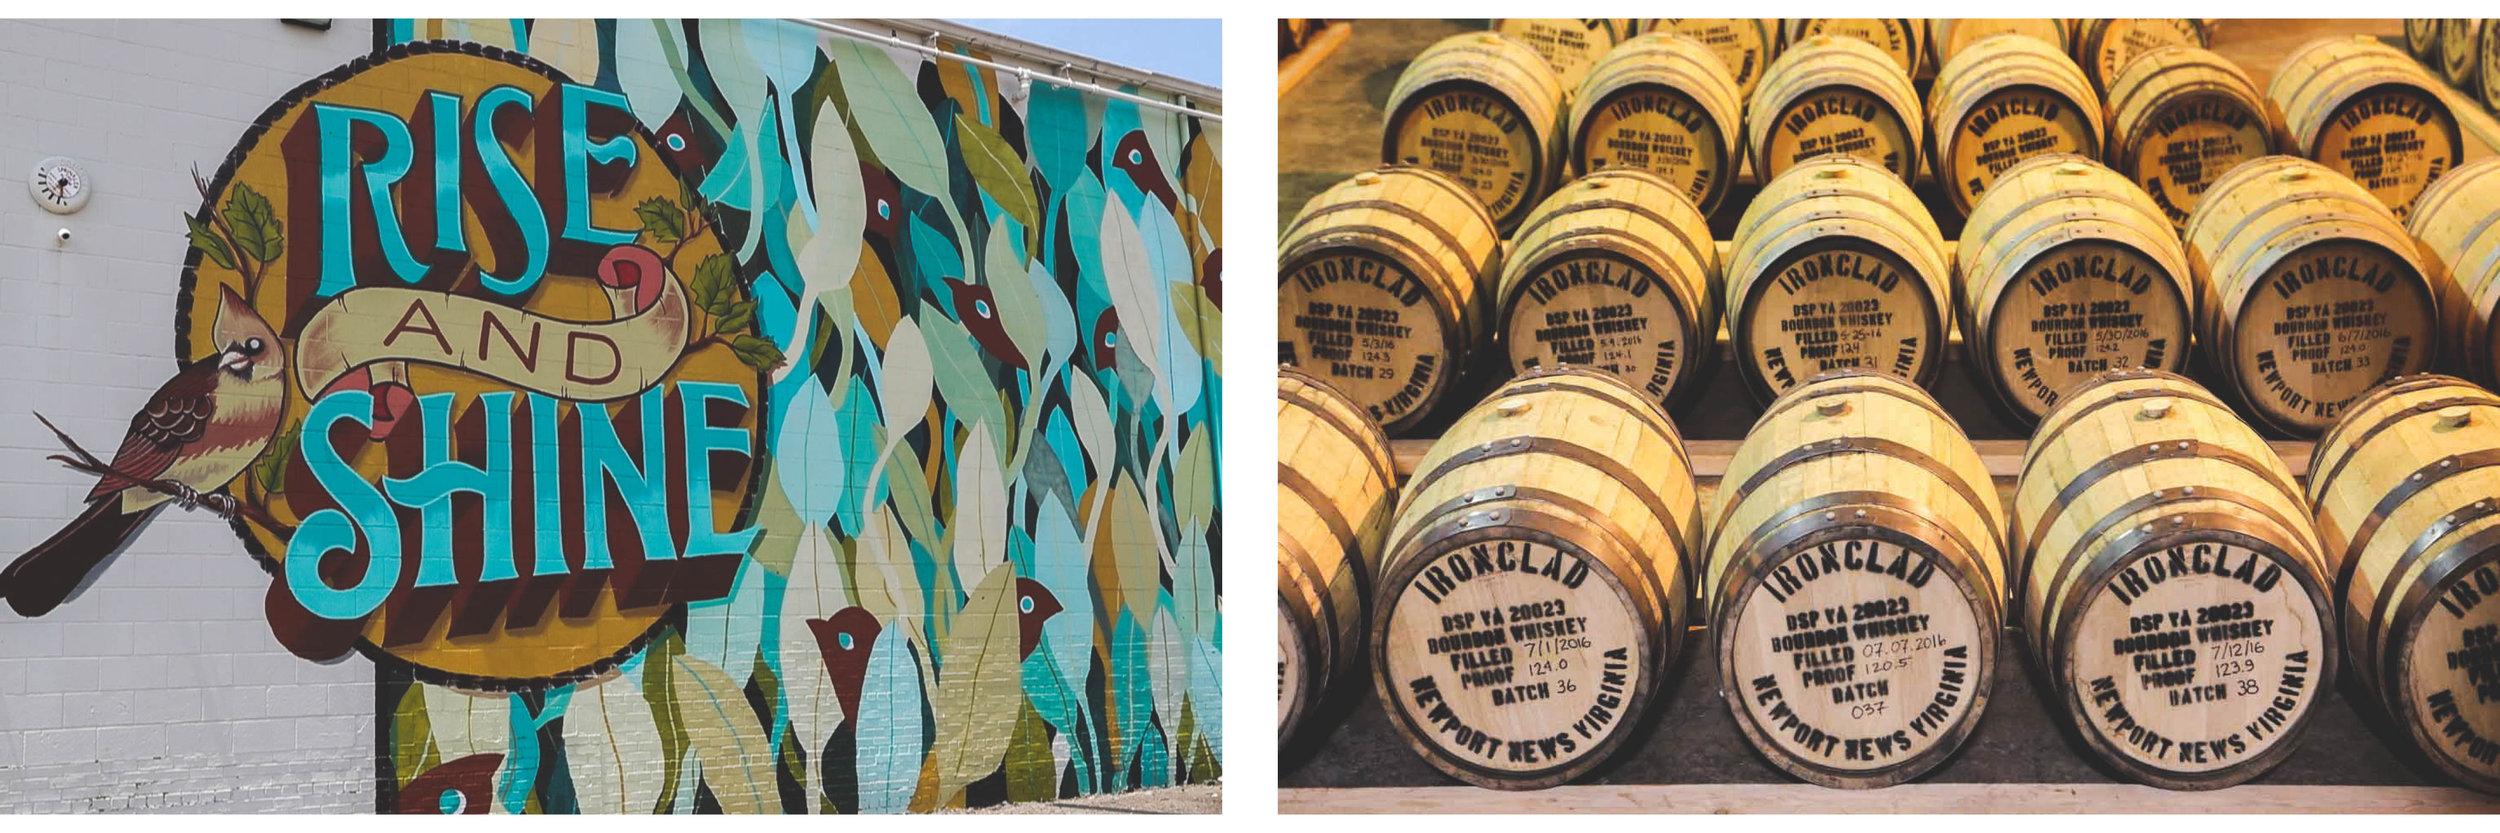 Images: Belle Isle Shine - Dan Currier / Ironclad Distillery - Dan Currier